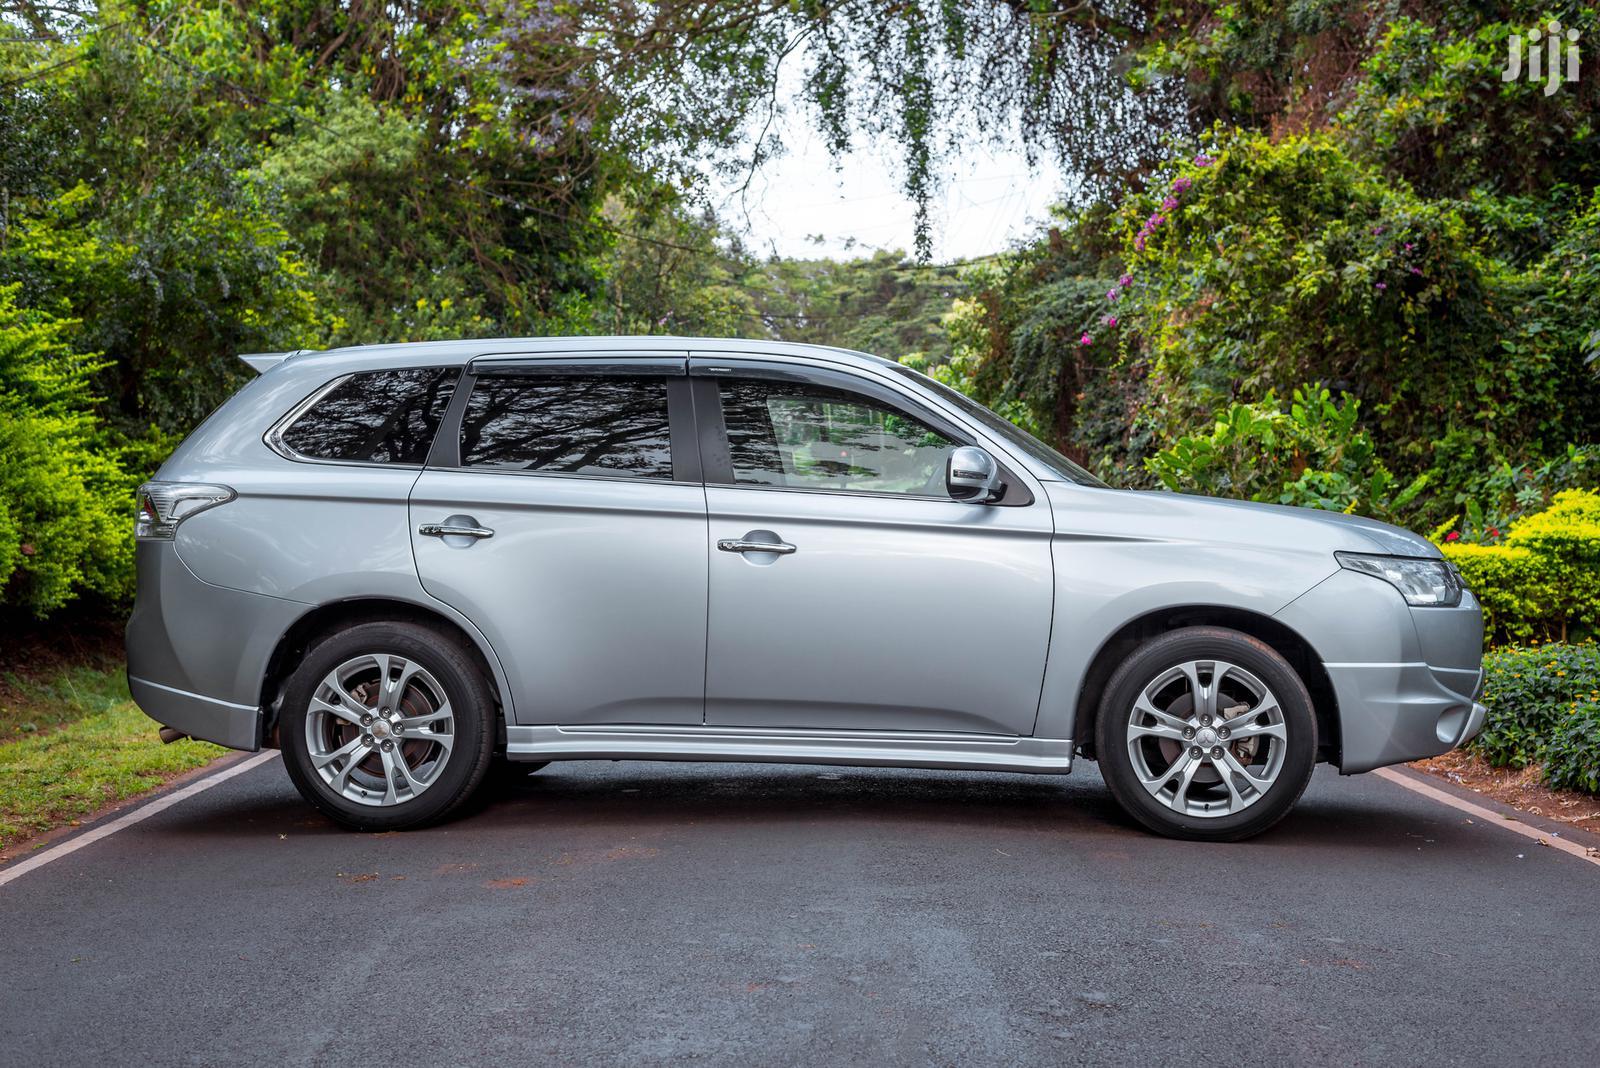 Mitsubishi Outlander 2013 Silver | Cars for sale in Kilimani, Nairobi, Kenya